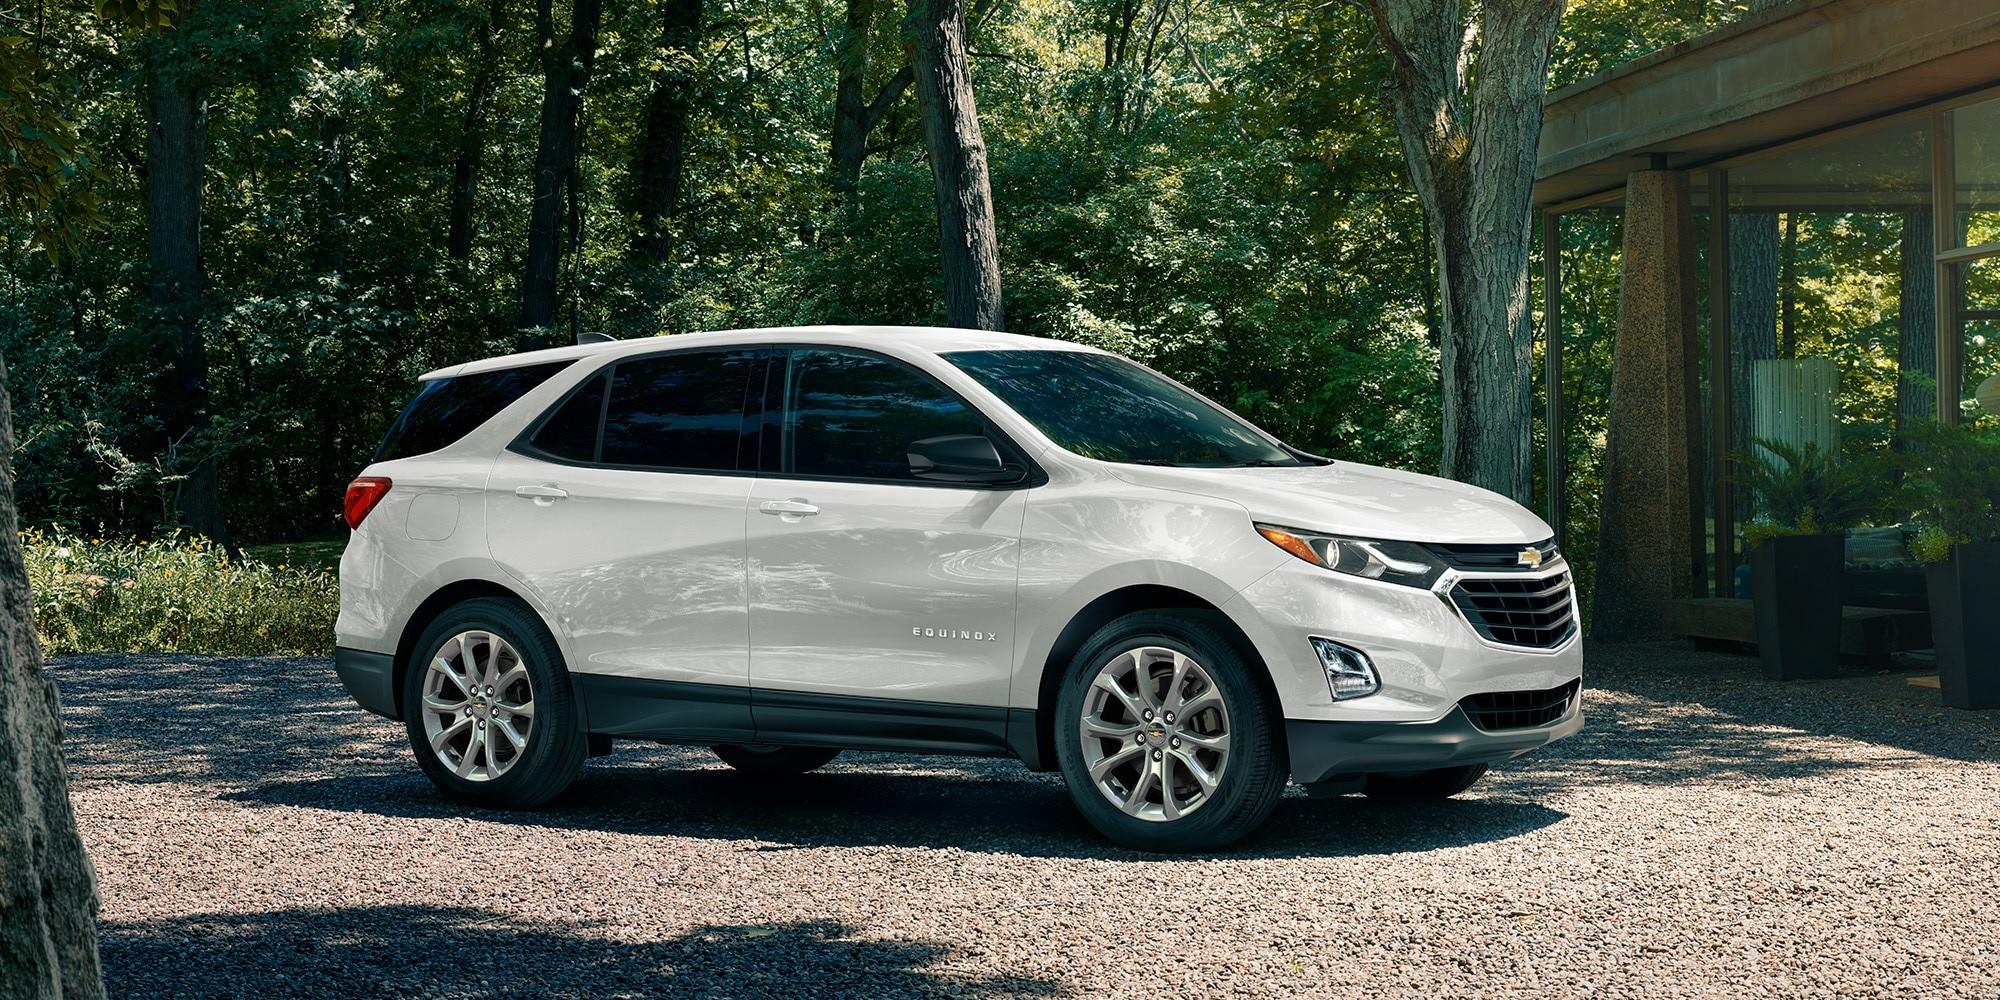 2020 Chevrolet Equinox for Sale near Lansing, MI